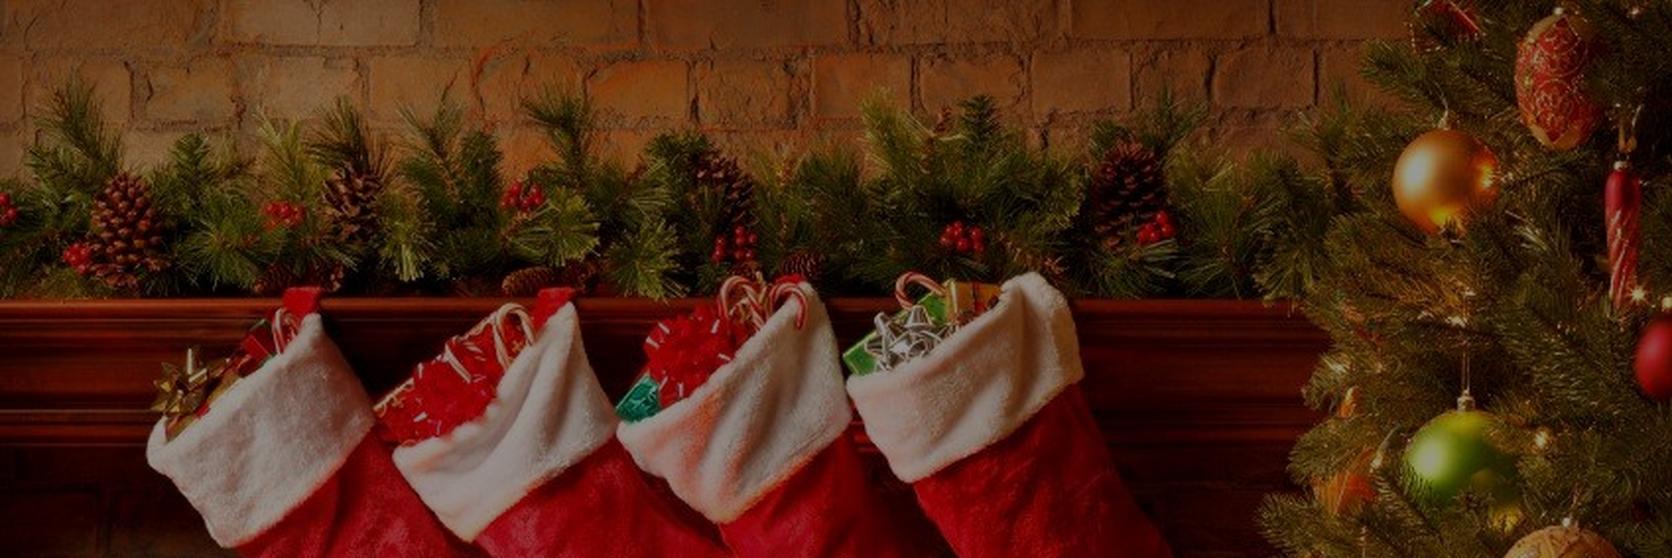 Christmas-around-the-world-1